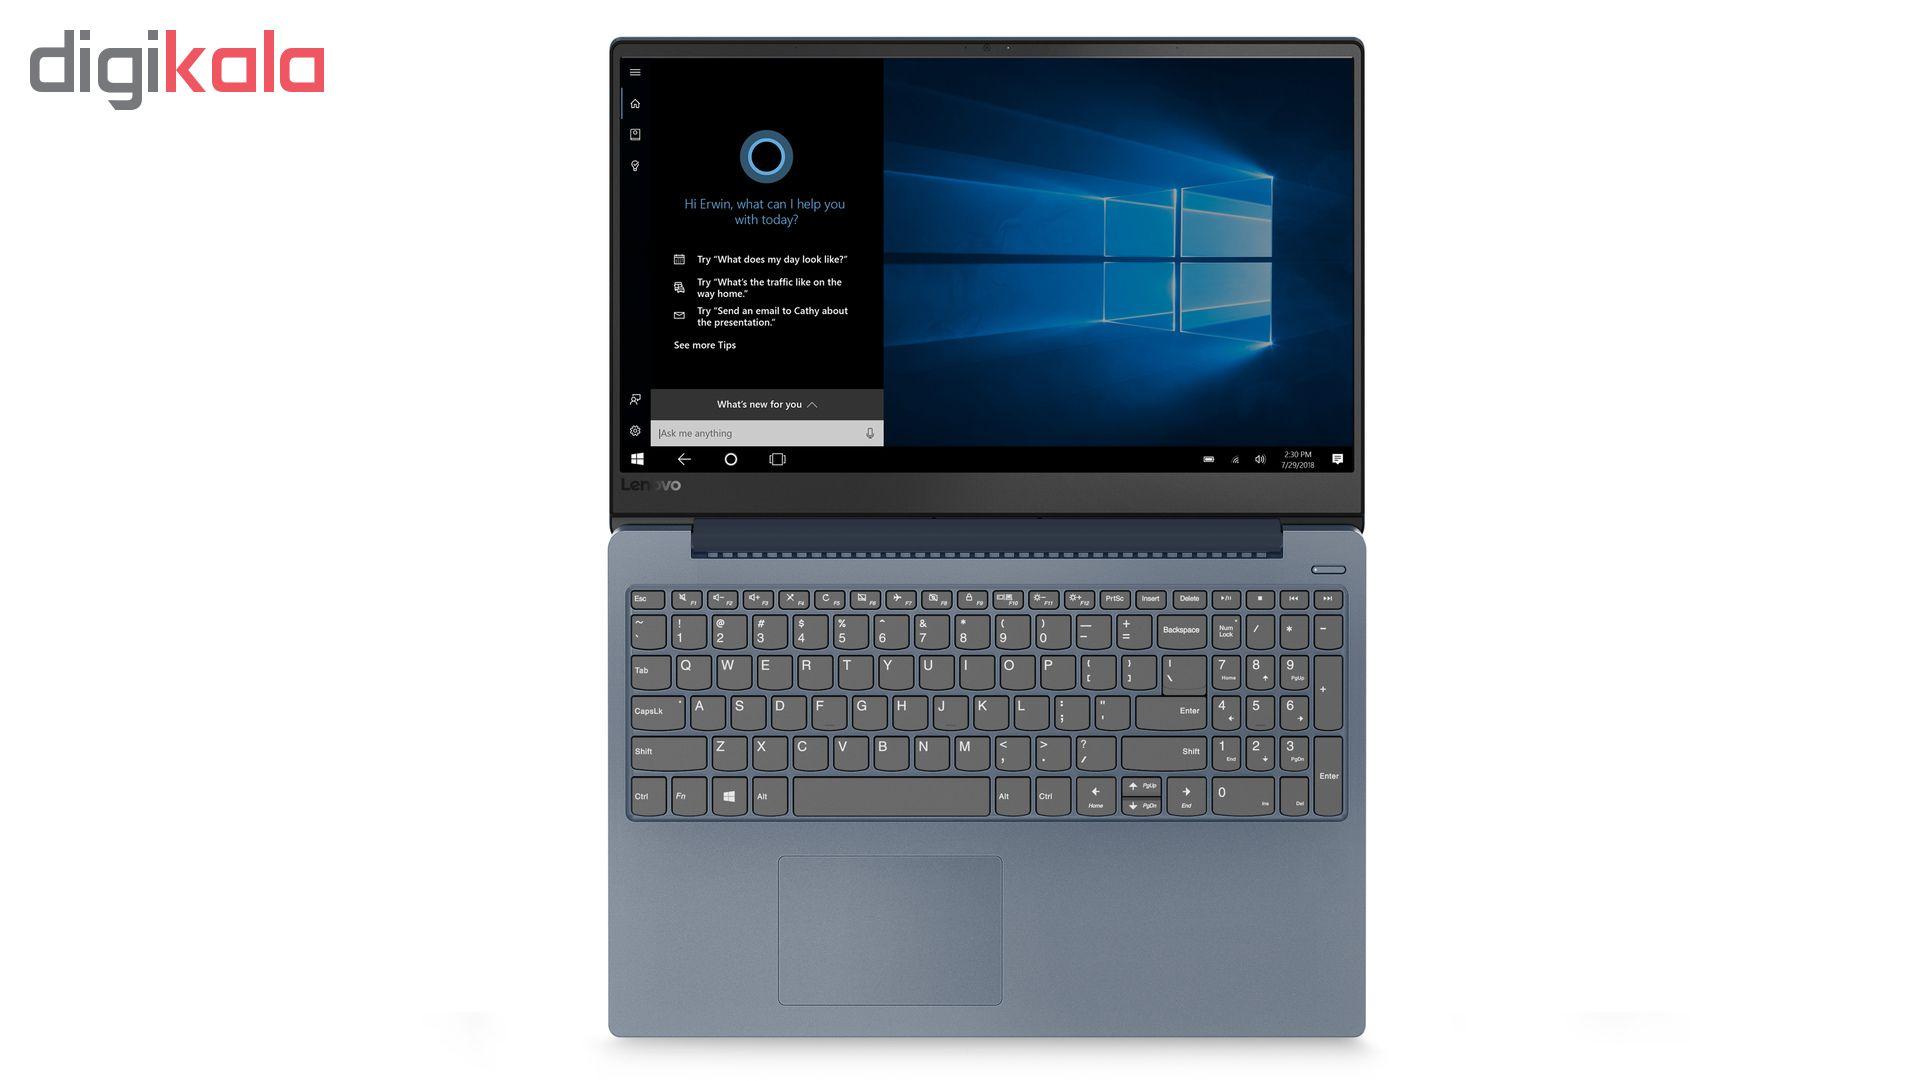 لپ تاپ 15 اینچی لنوو مدل Ideapad 330s - XB